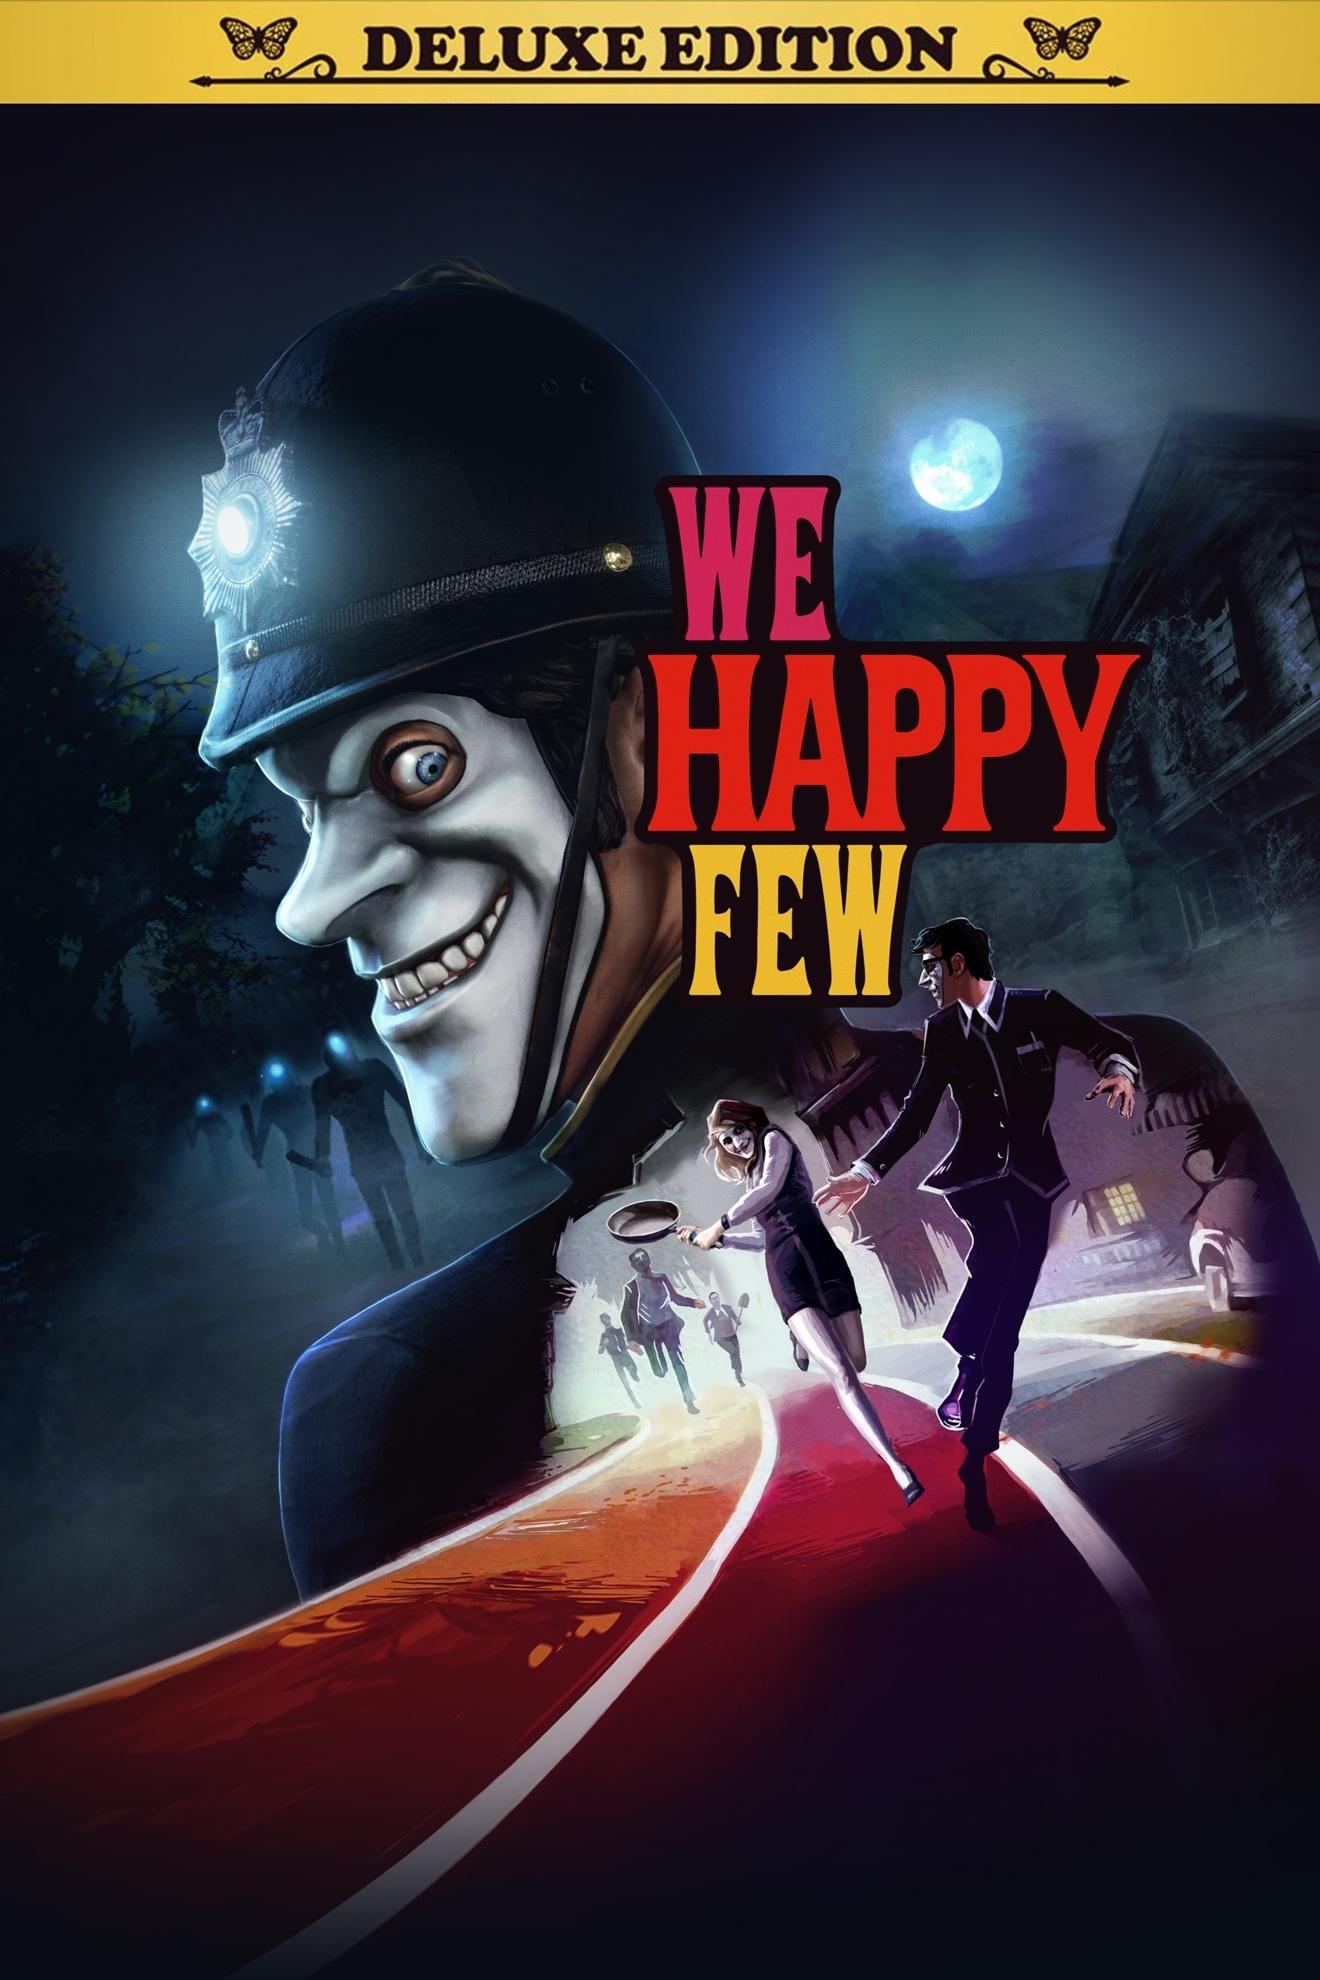 We Happy Few - Deluxe Edition